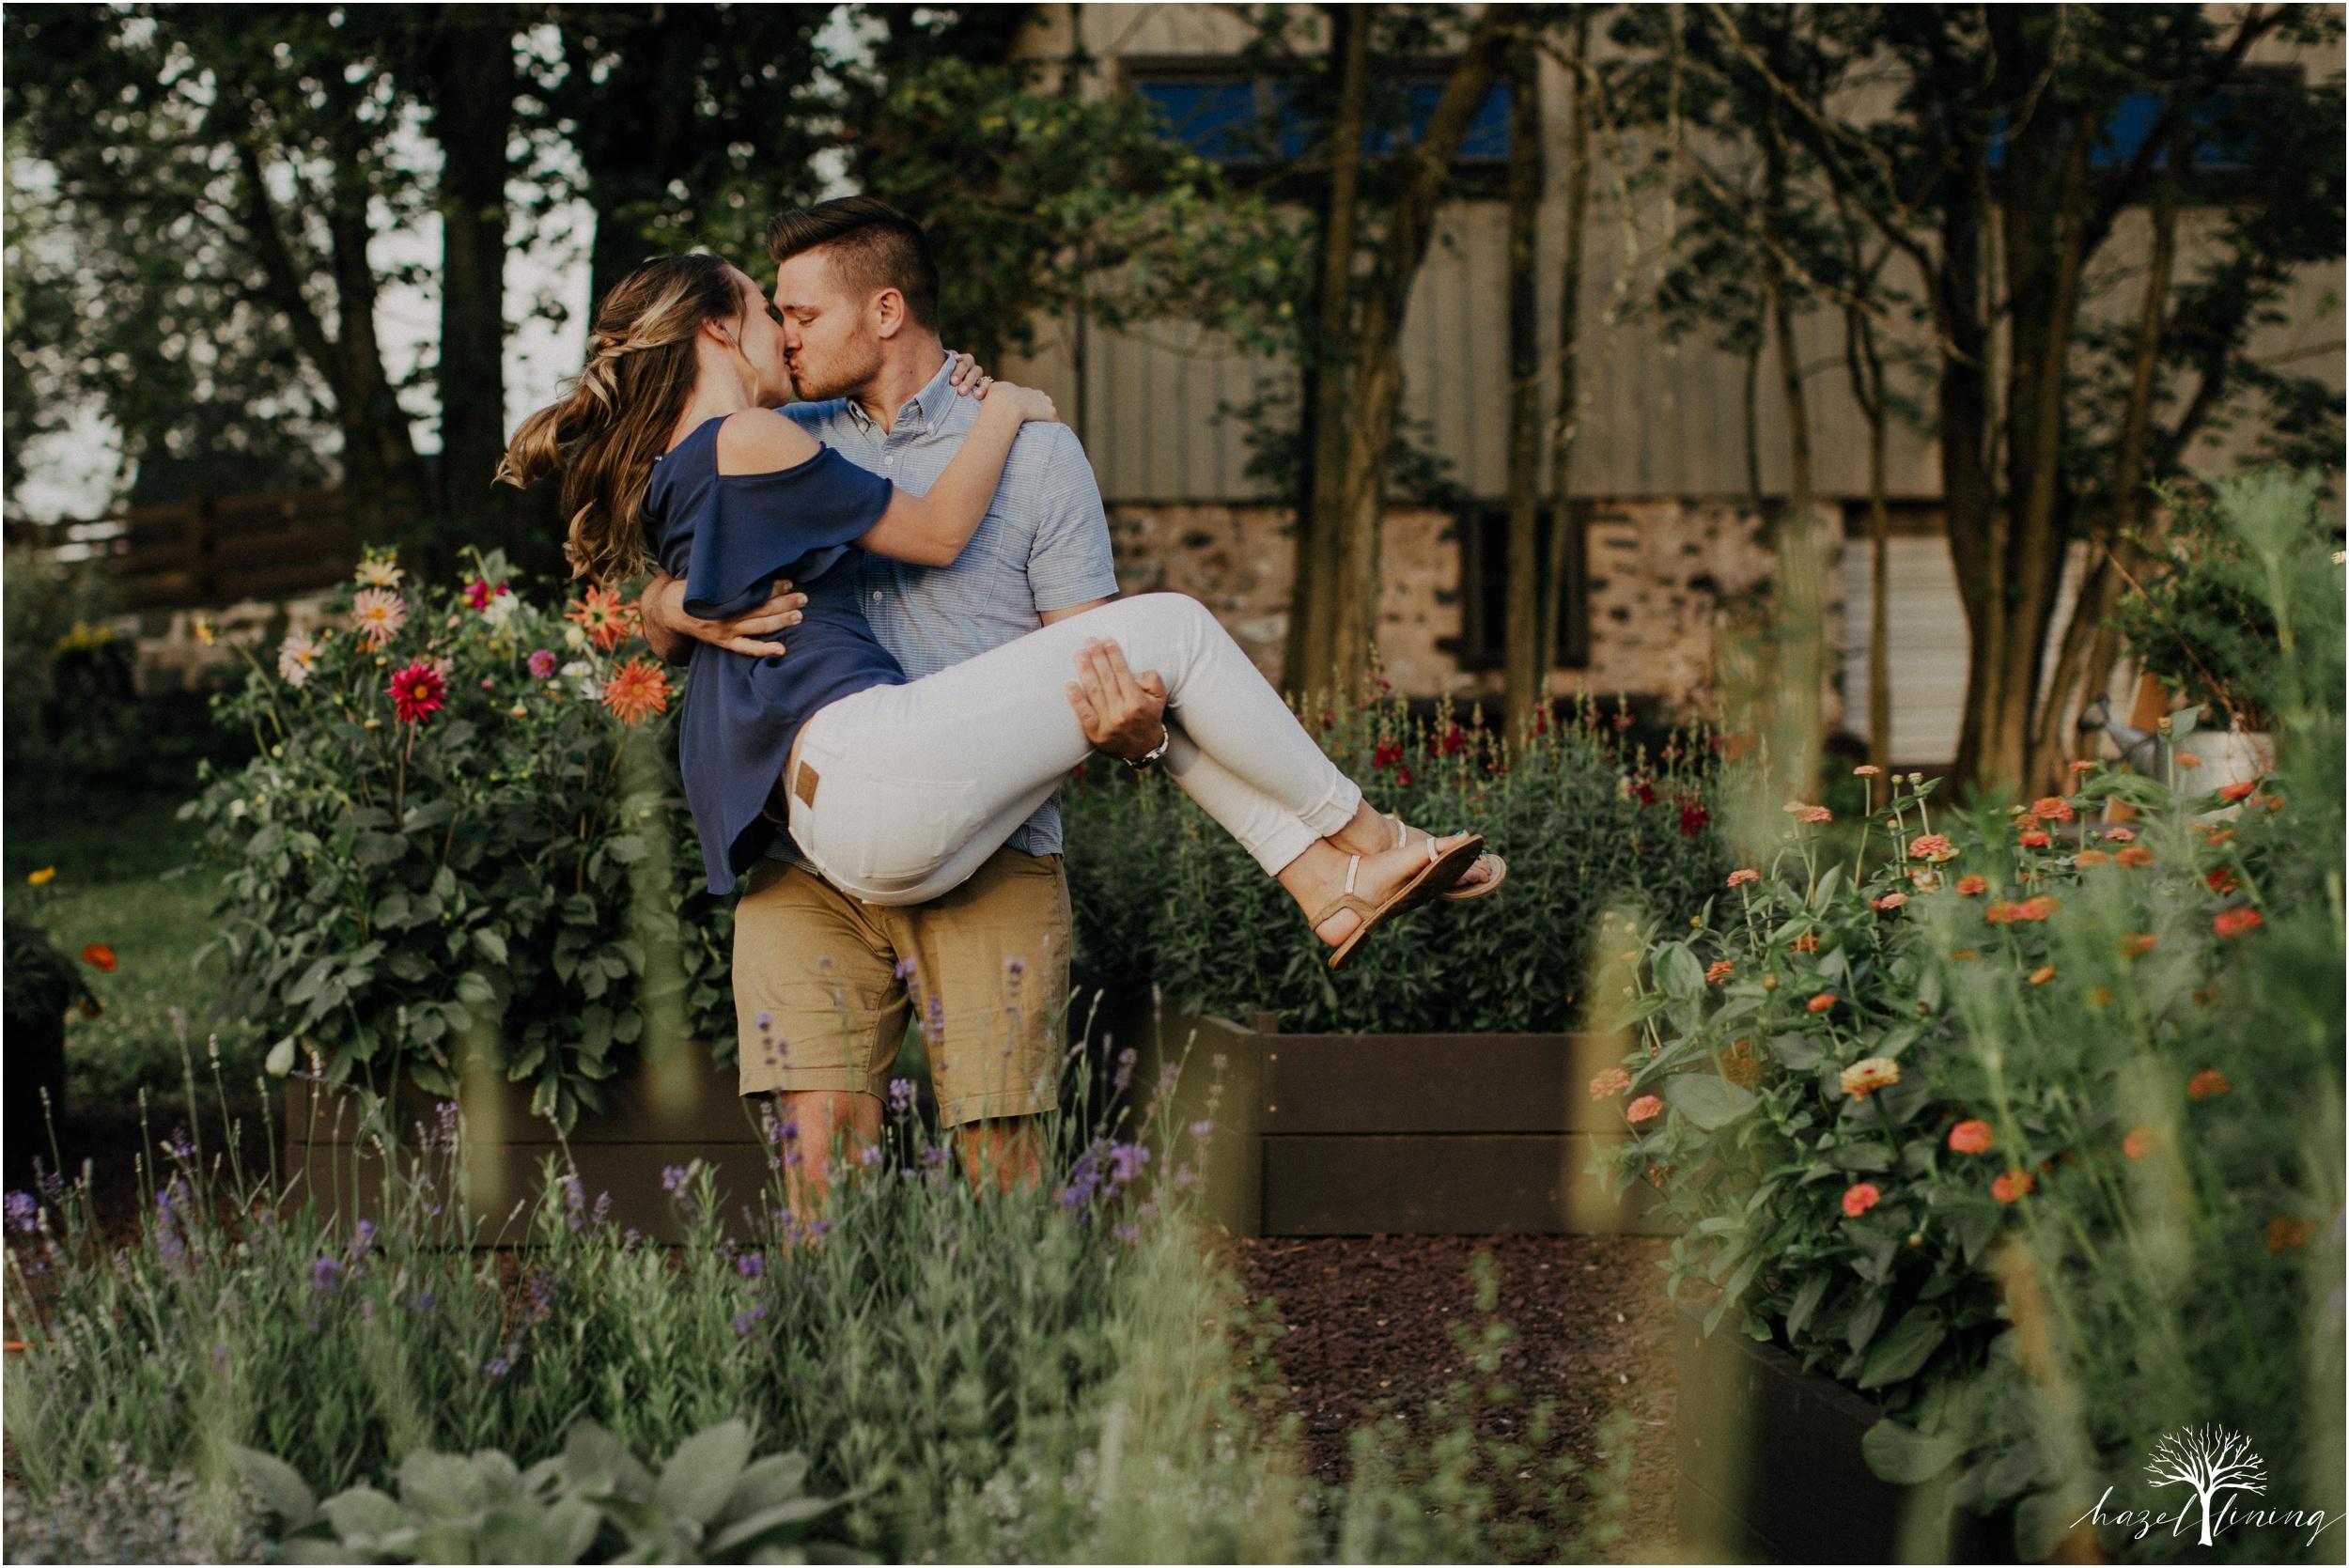 rachel-warner-chris-niedrist-the-farm-bakery-and-events-quakertown-pa-summer-engagement-hazel-lining-photography-destination-elopement-wedding-engagement-photography_0061.jpg